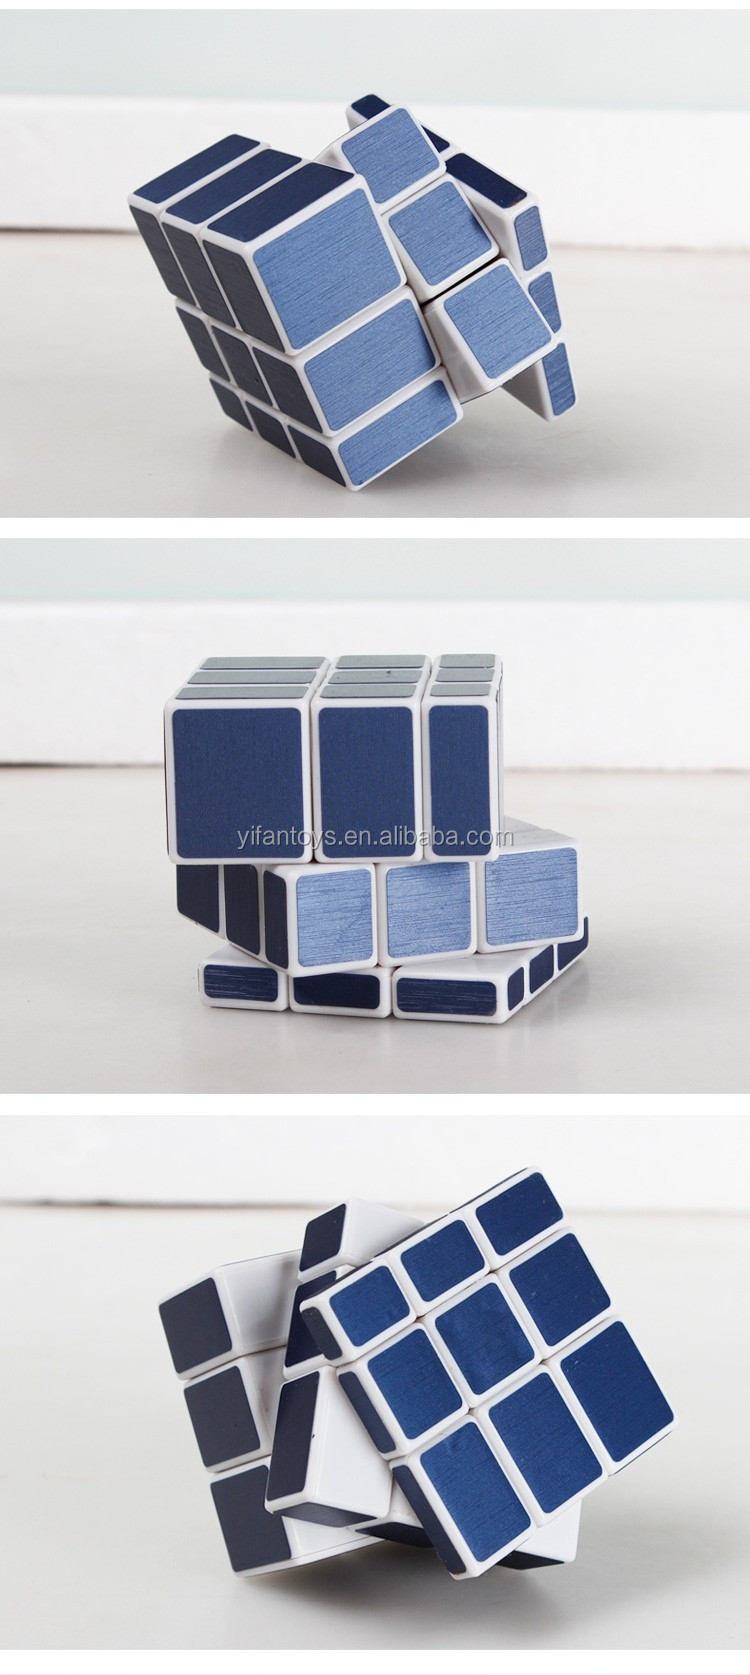 Y9831j 5.7cm Yongjun Blue Color Mirror Magic Cubes 3x3 Diy Toys ...